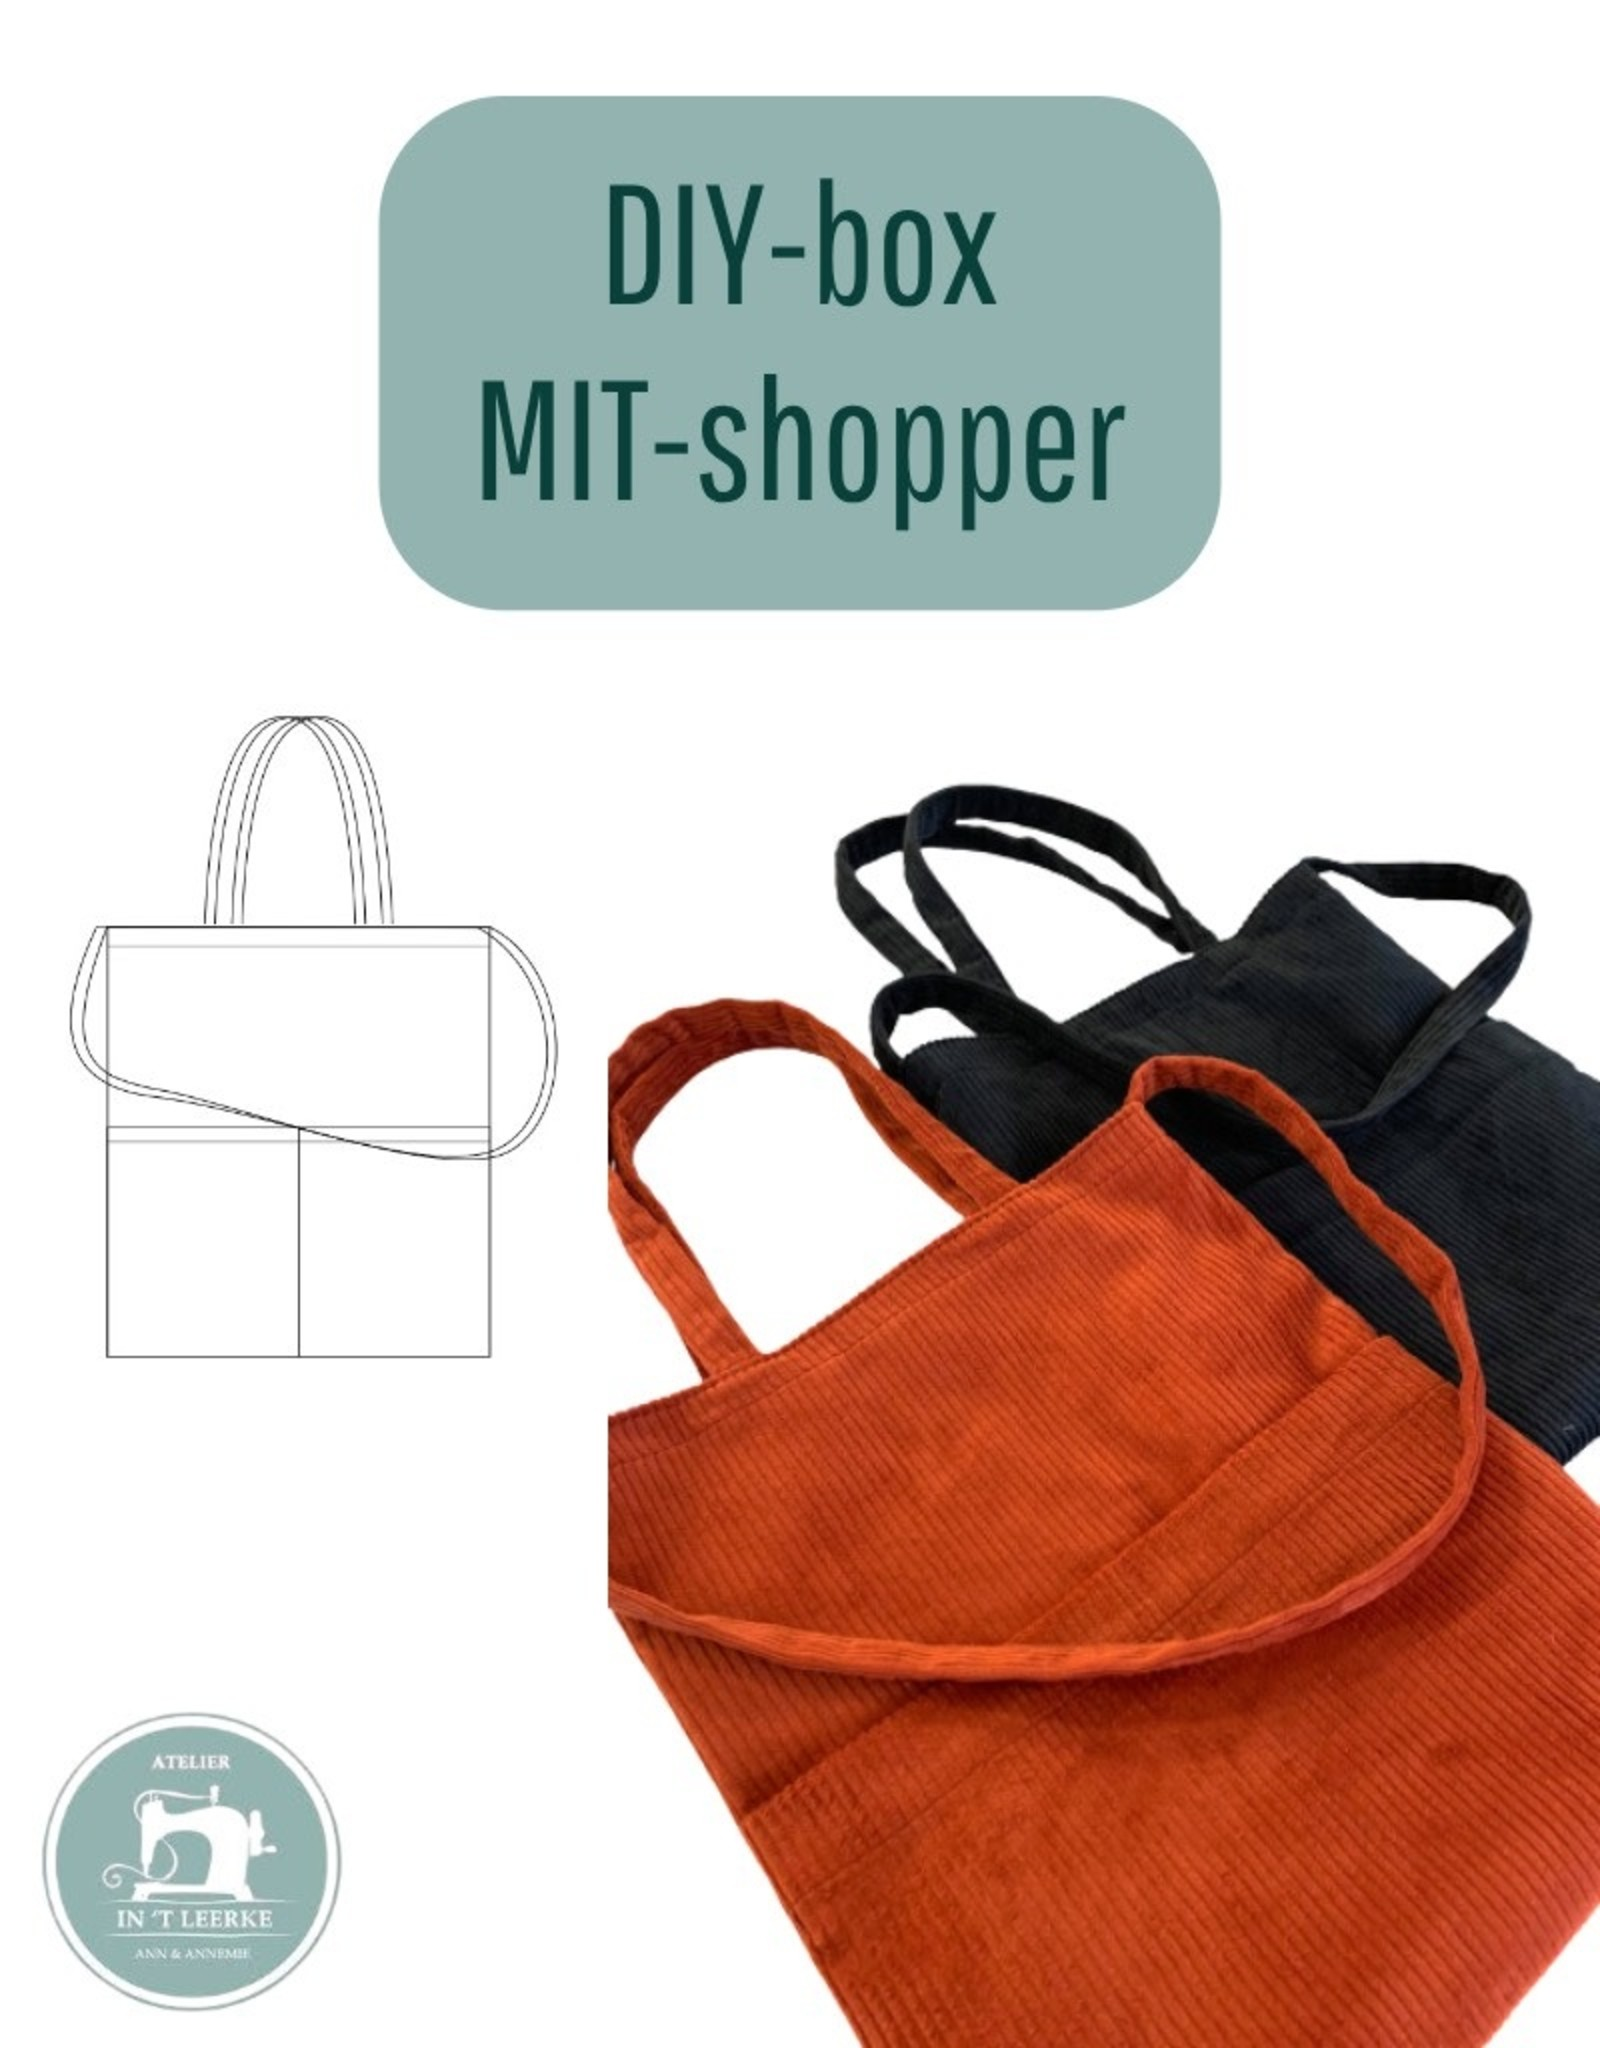 DIY-box - MIT-shopper